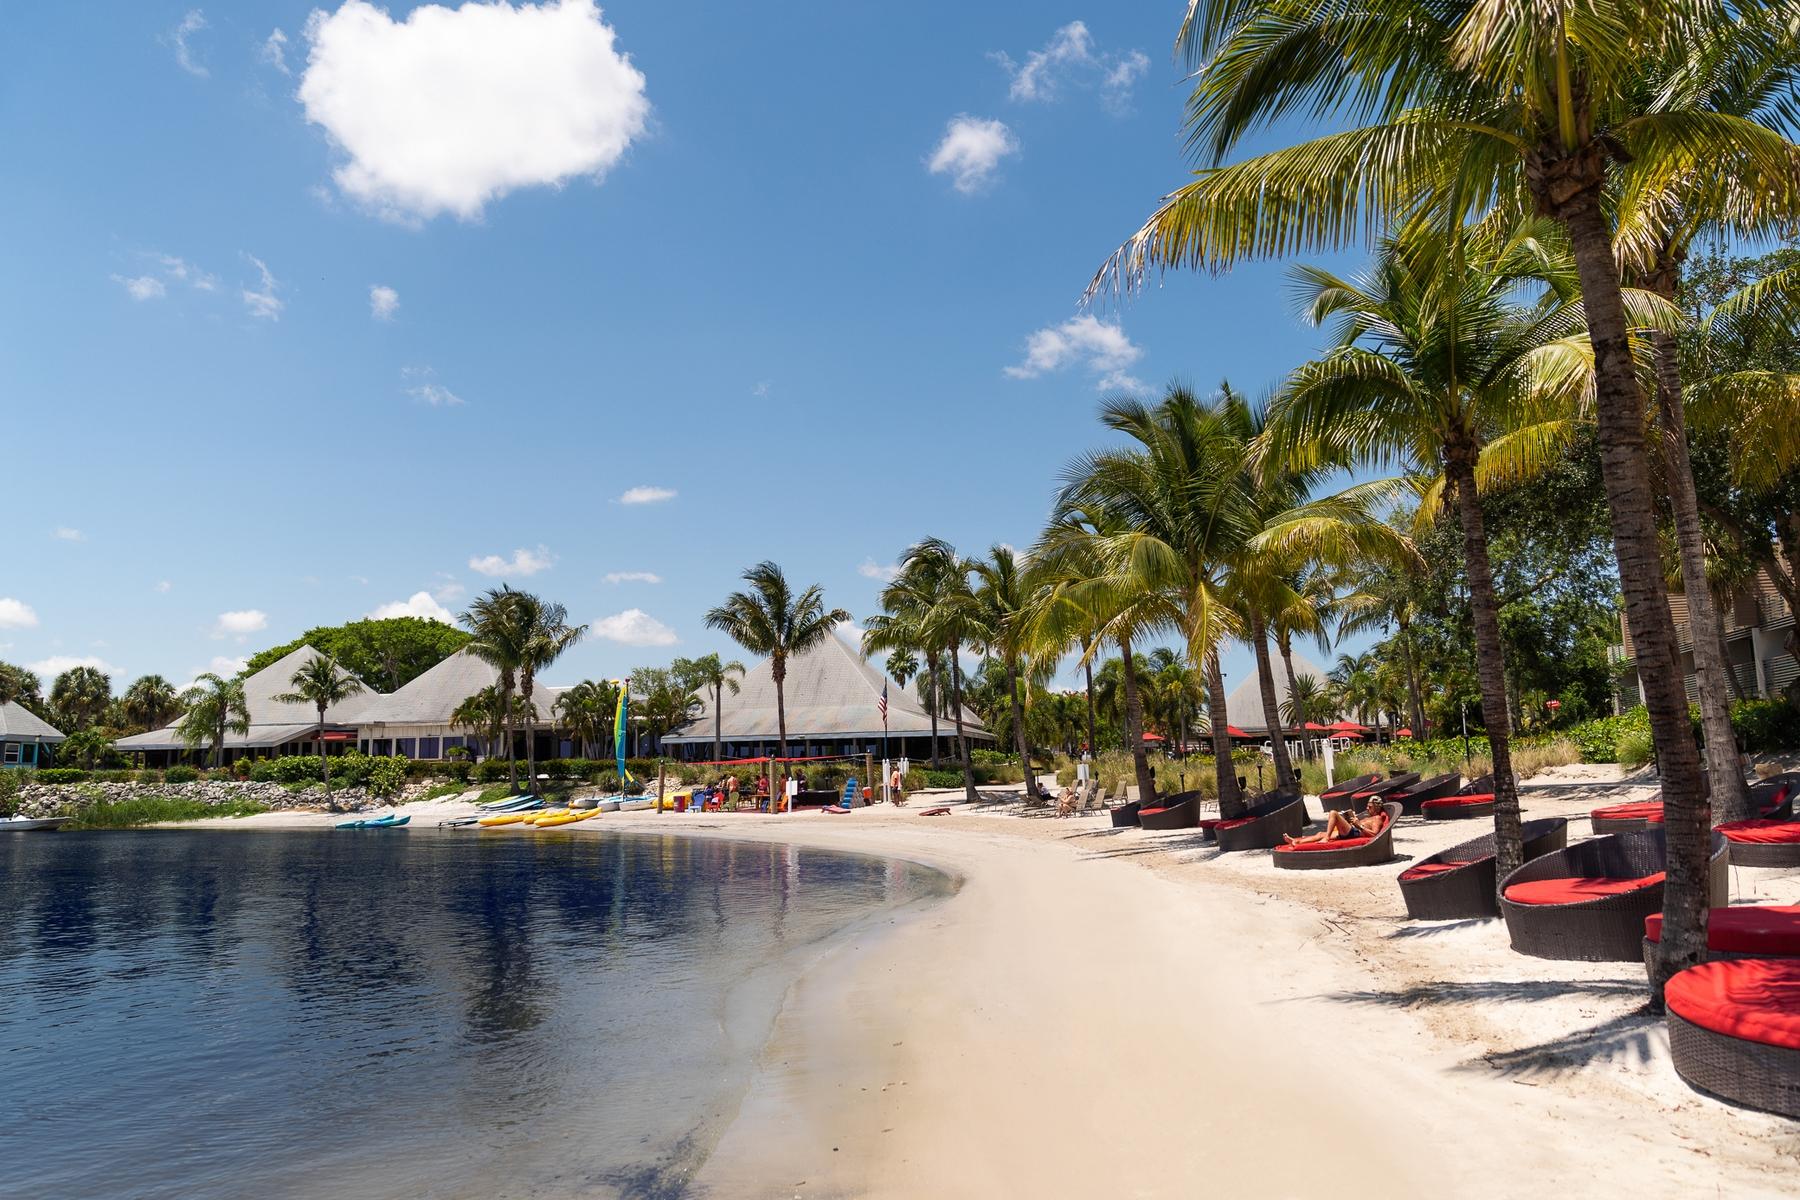 Club Med Sandpiper Bay in Port St. Lucie, Florida